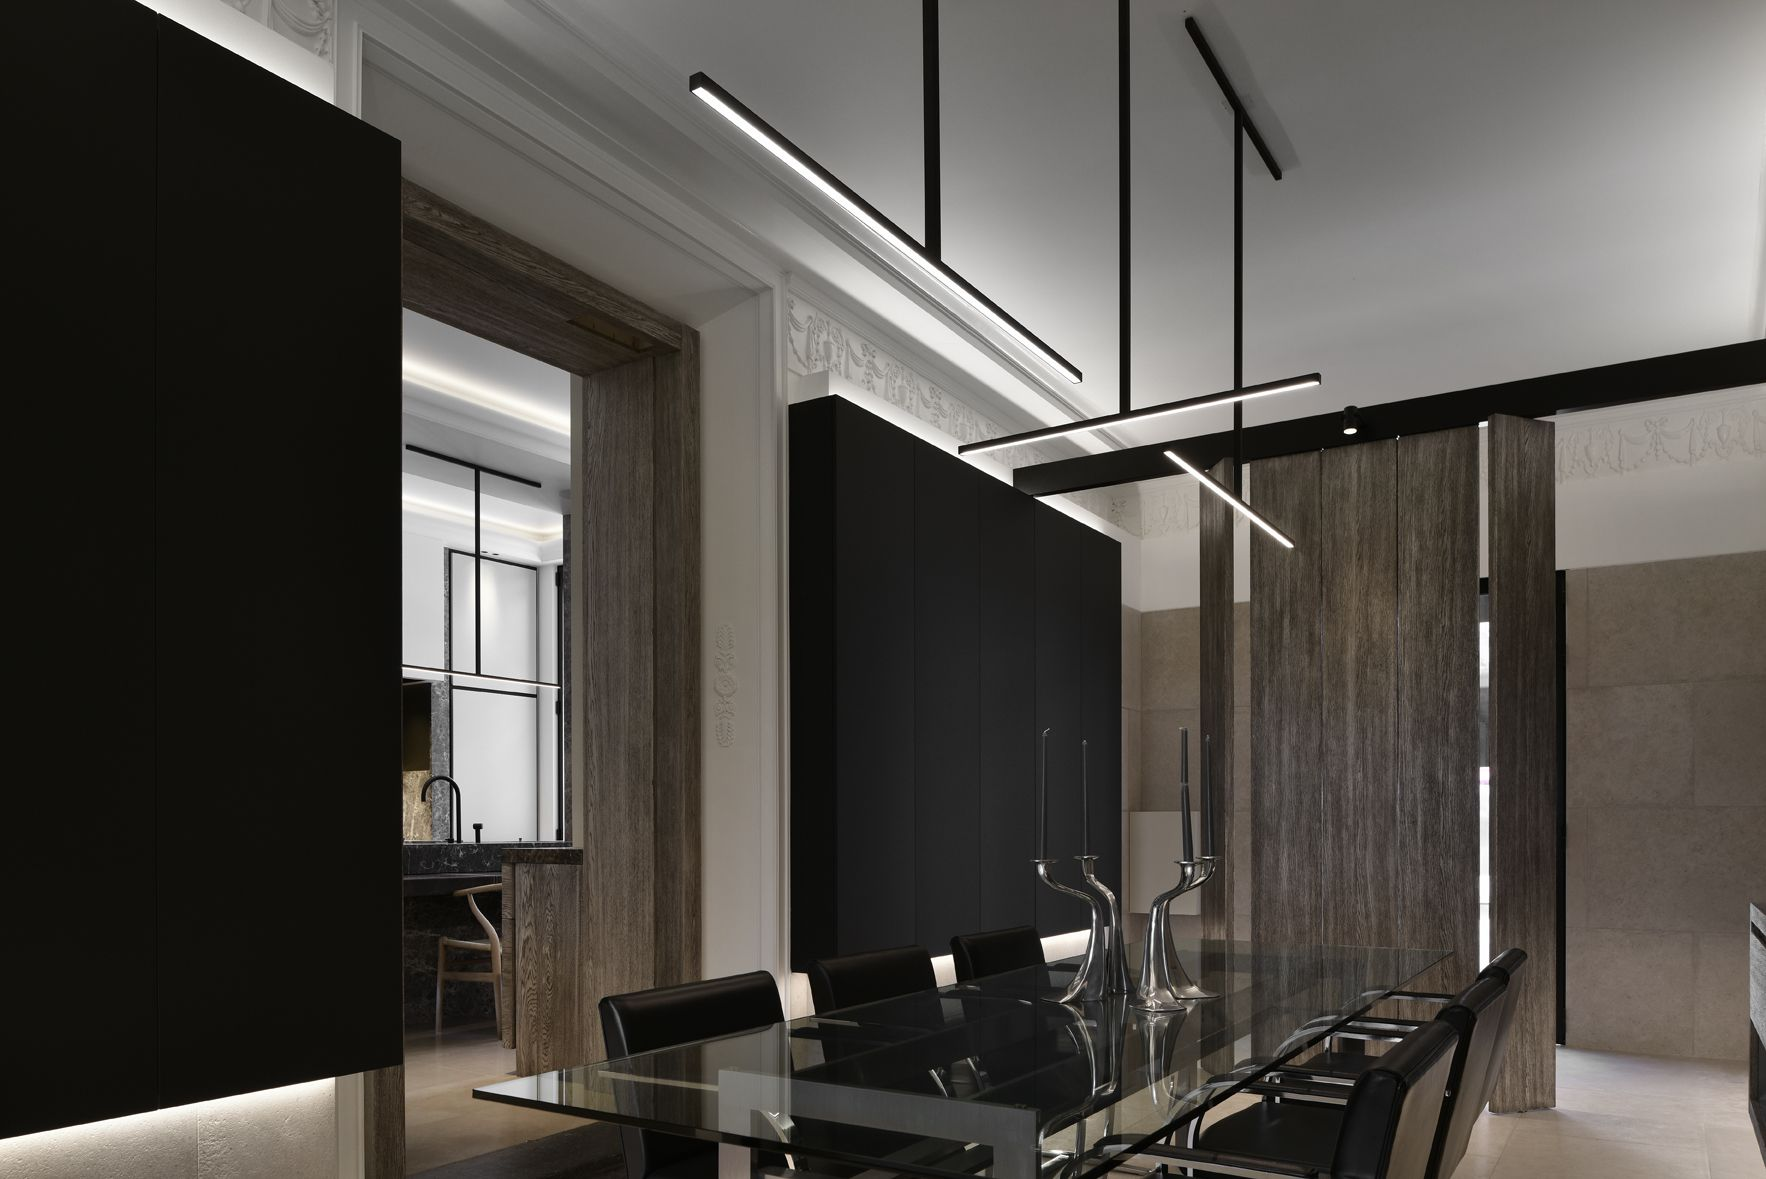 Kreon - Fuga, pendel | Architecturale Verlichting | Pinterest ...